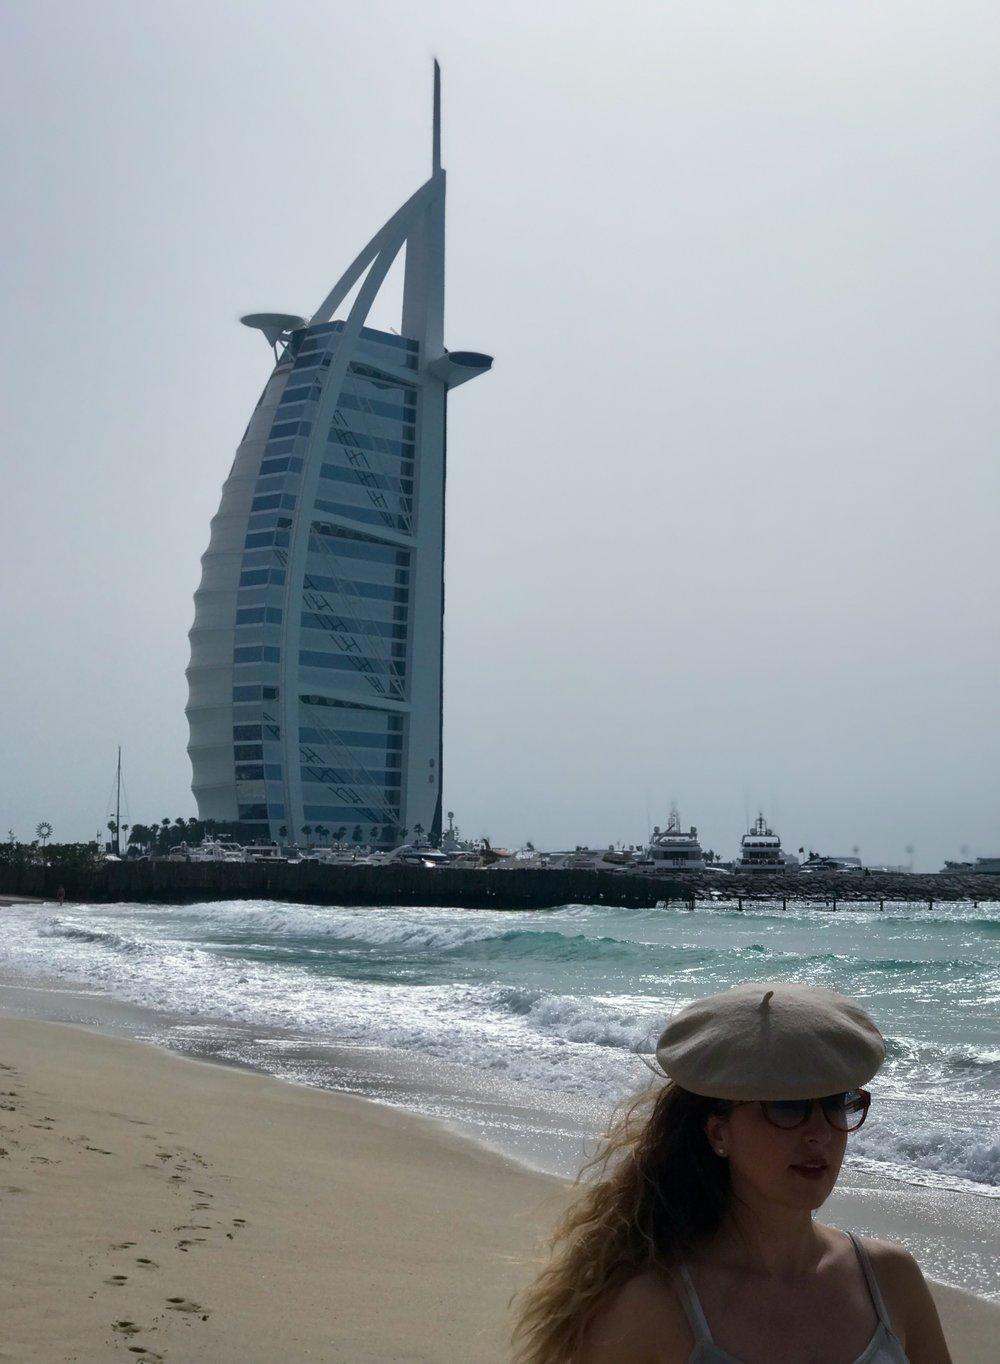 JUMEIRAH BEACH • DUBAI, UAE PHOTOGRAPHER: NATALIA